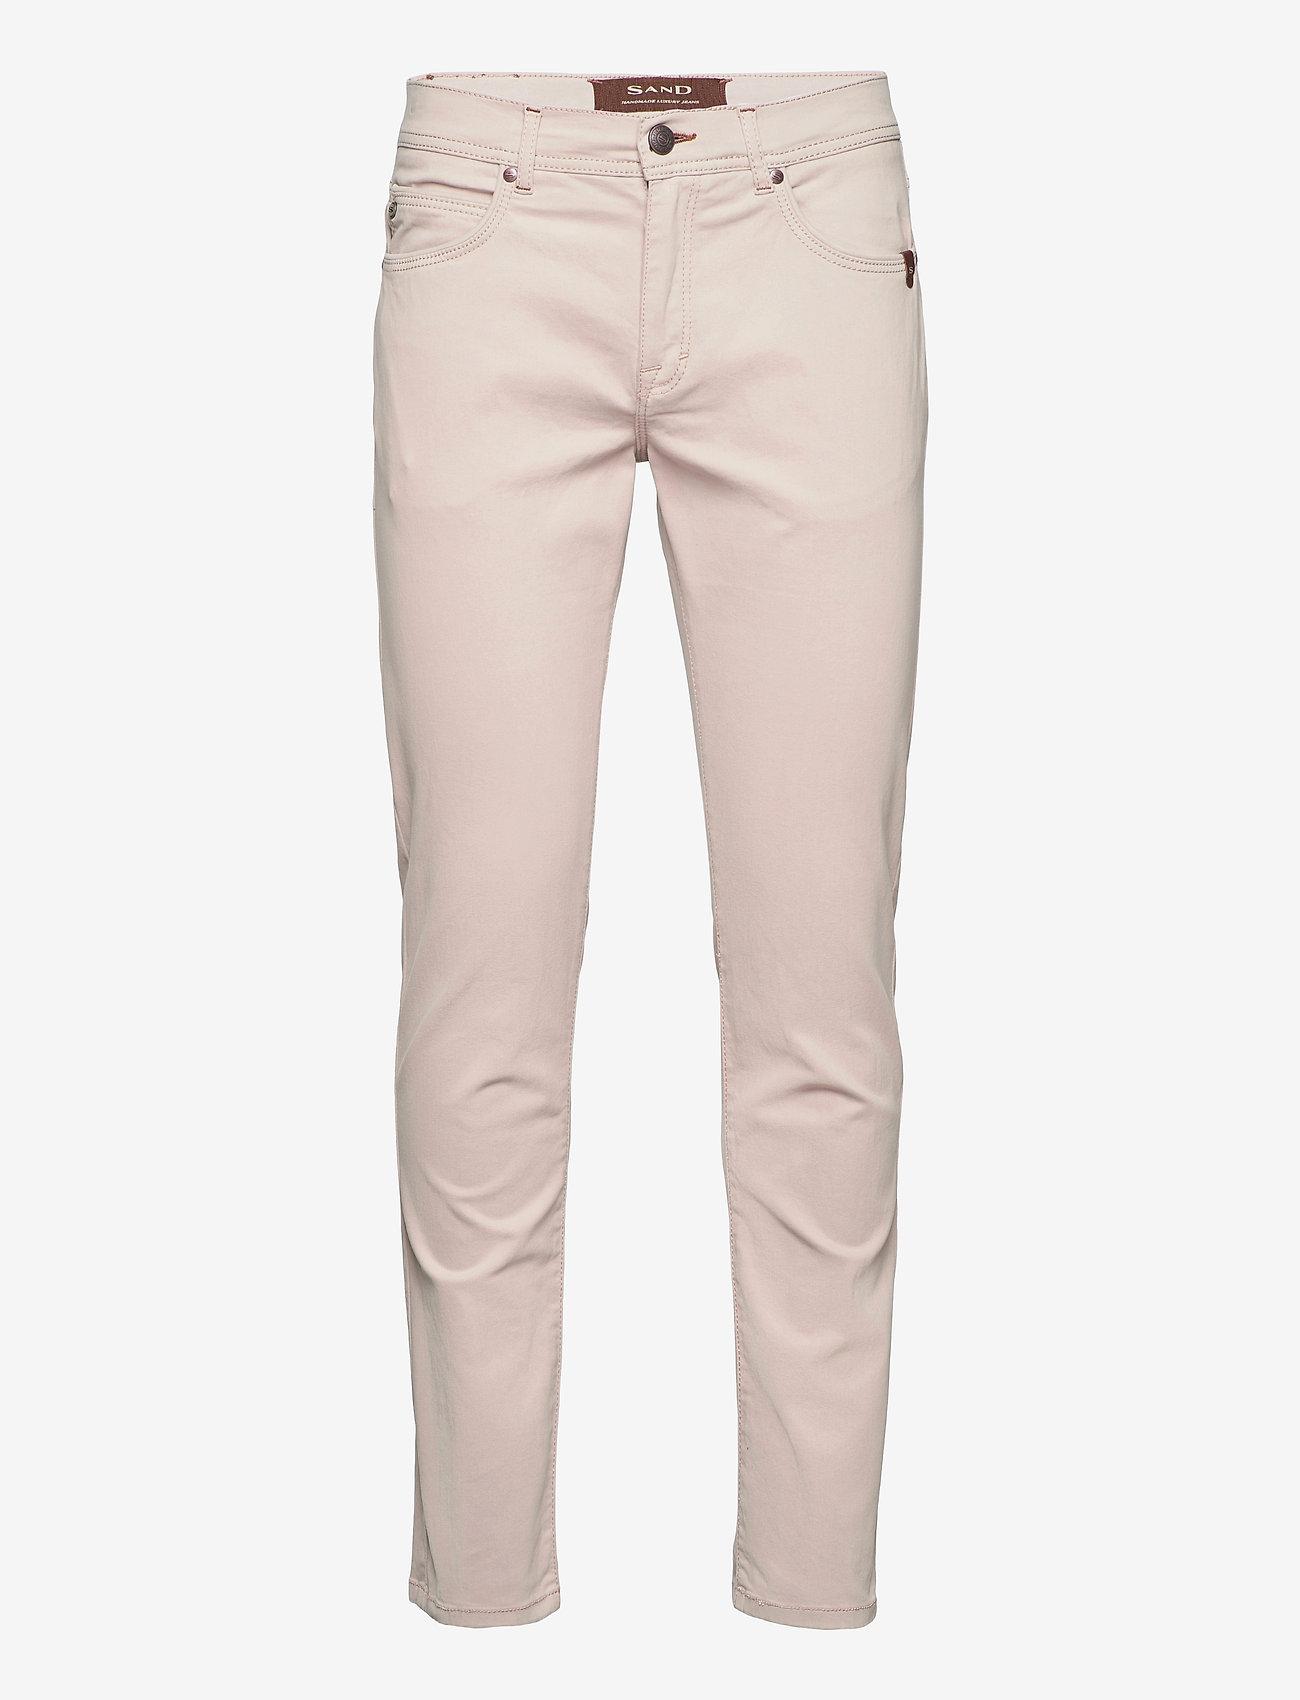 "SAND - Suede Touch - Burton NS 32"" - regular jeans - light camel - 0"